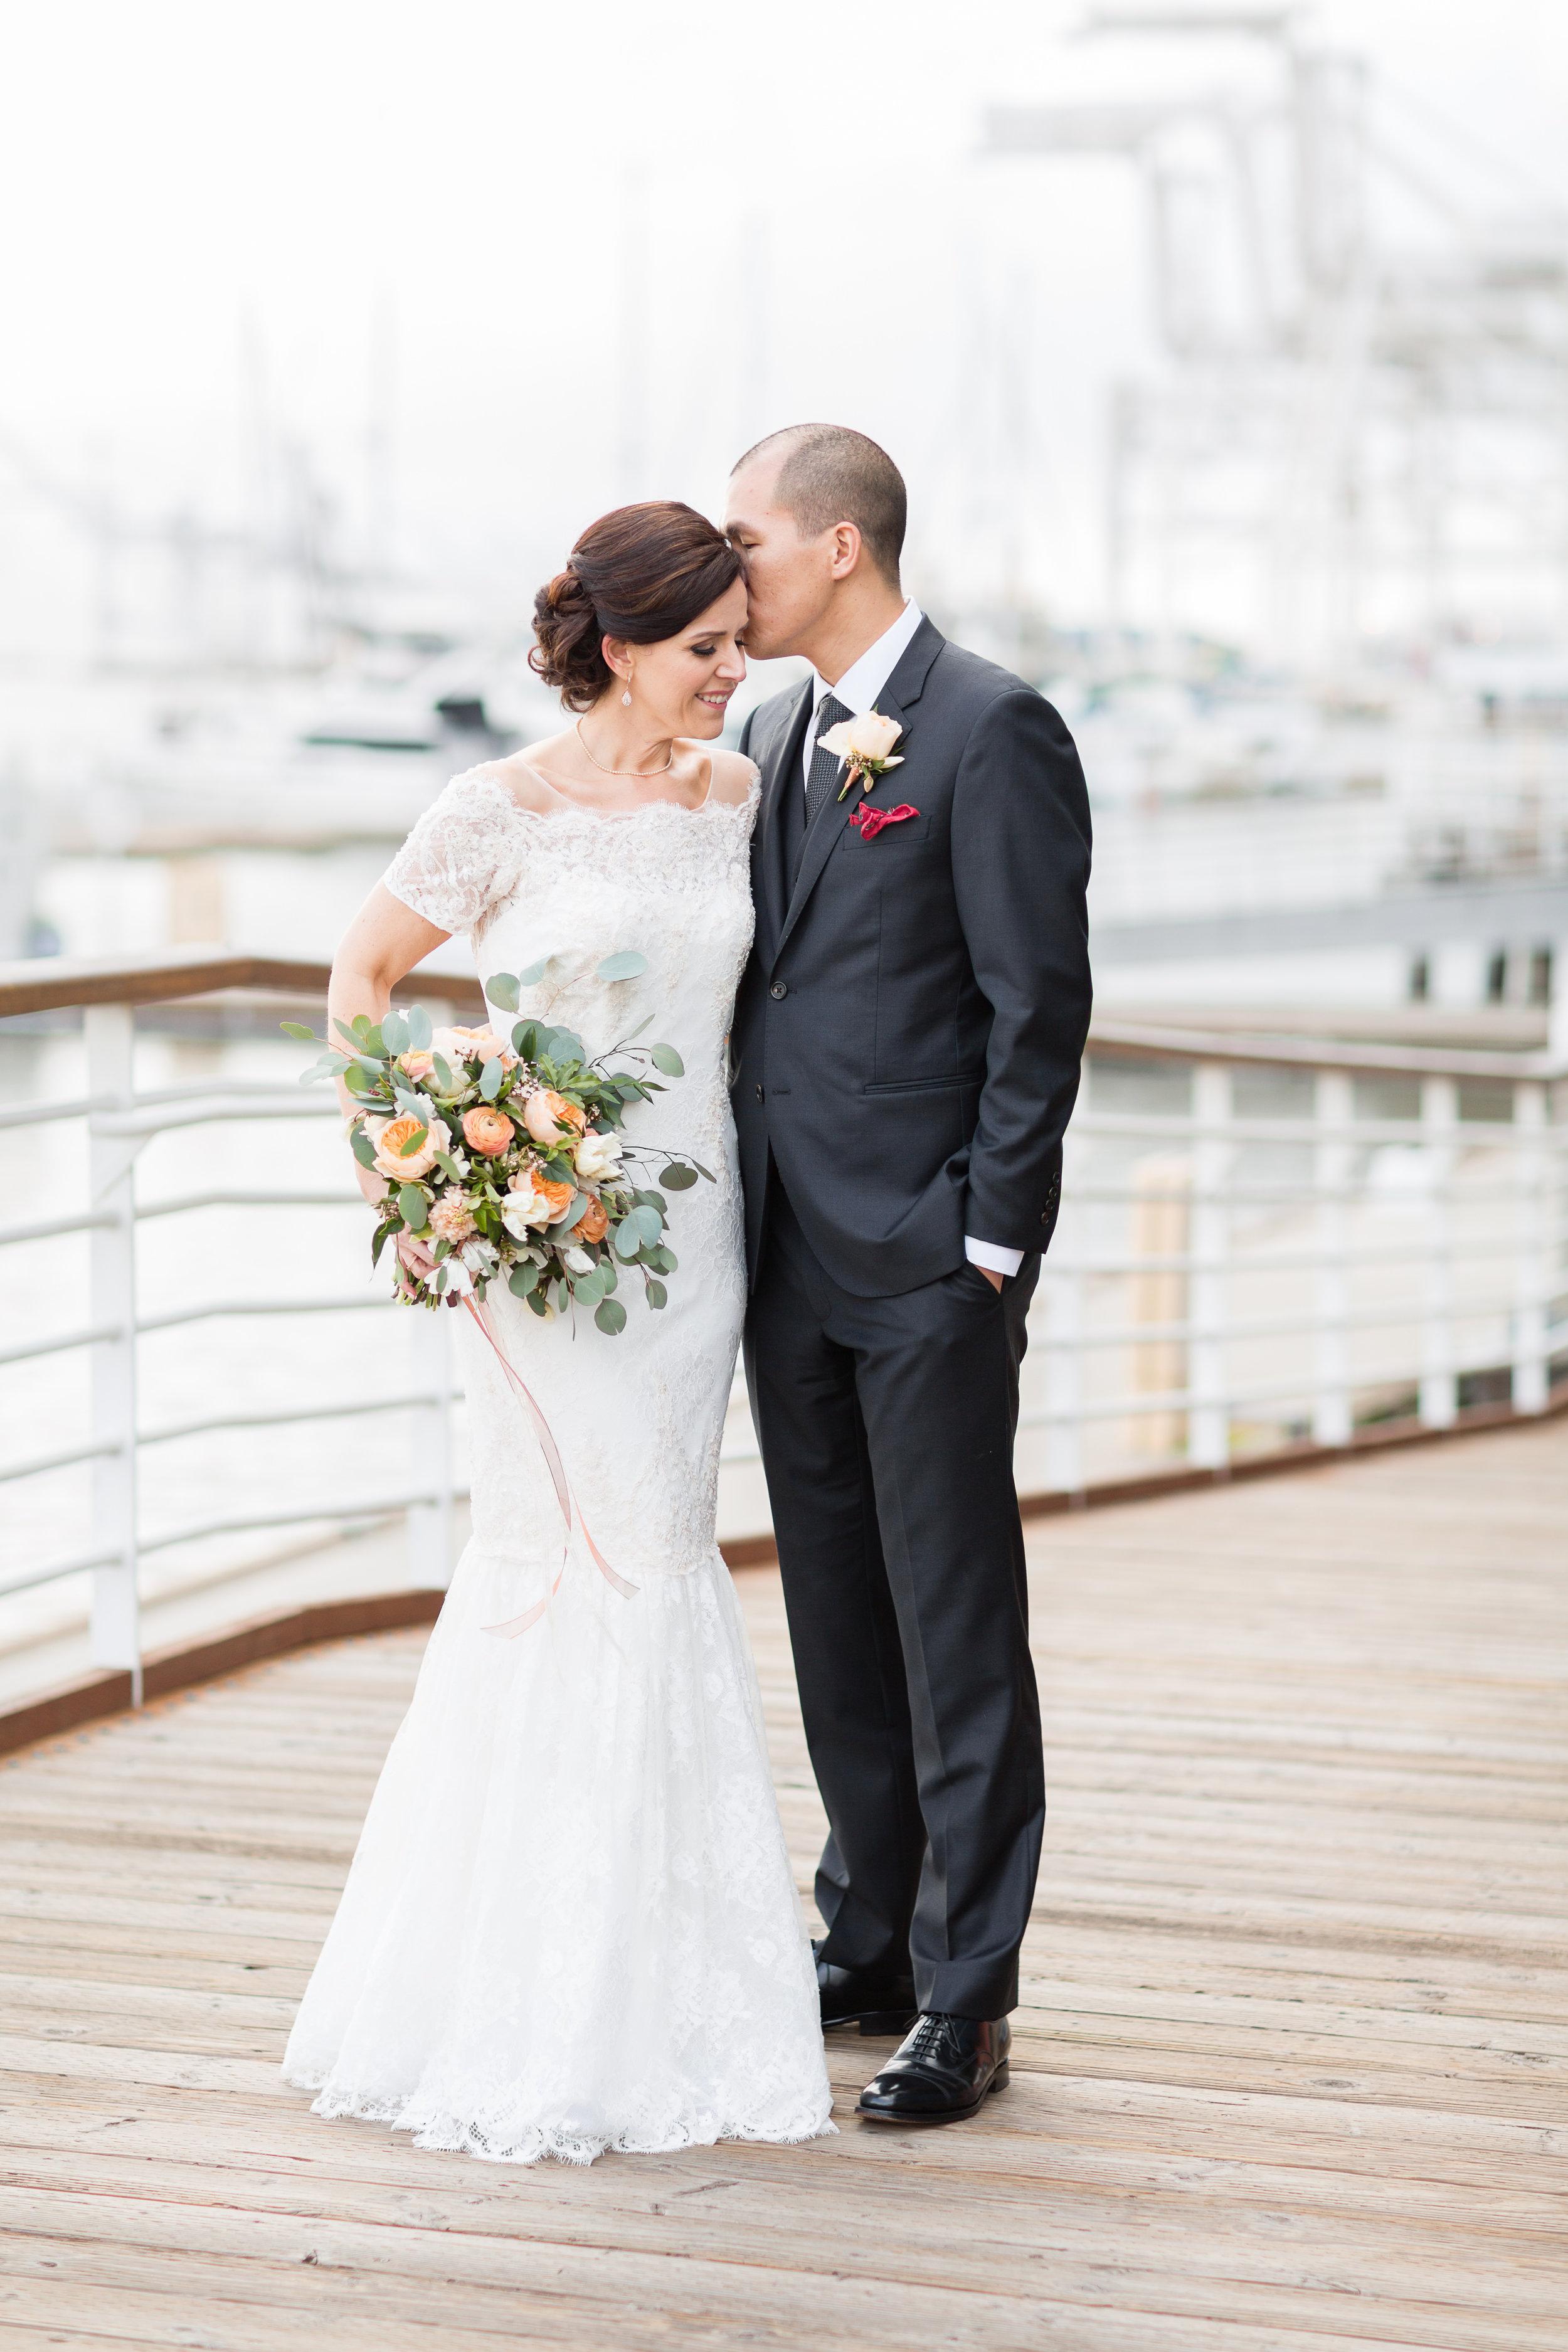 Liz-Henry-Forge-Oakland-Wedding-208.jpg